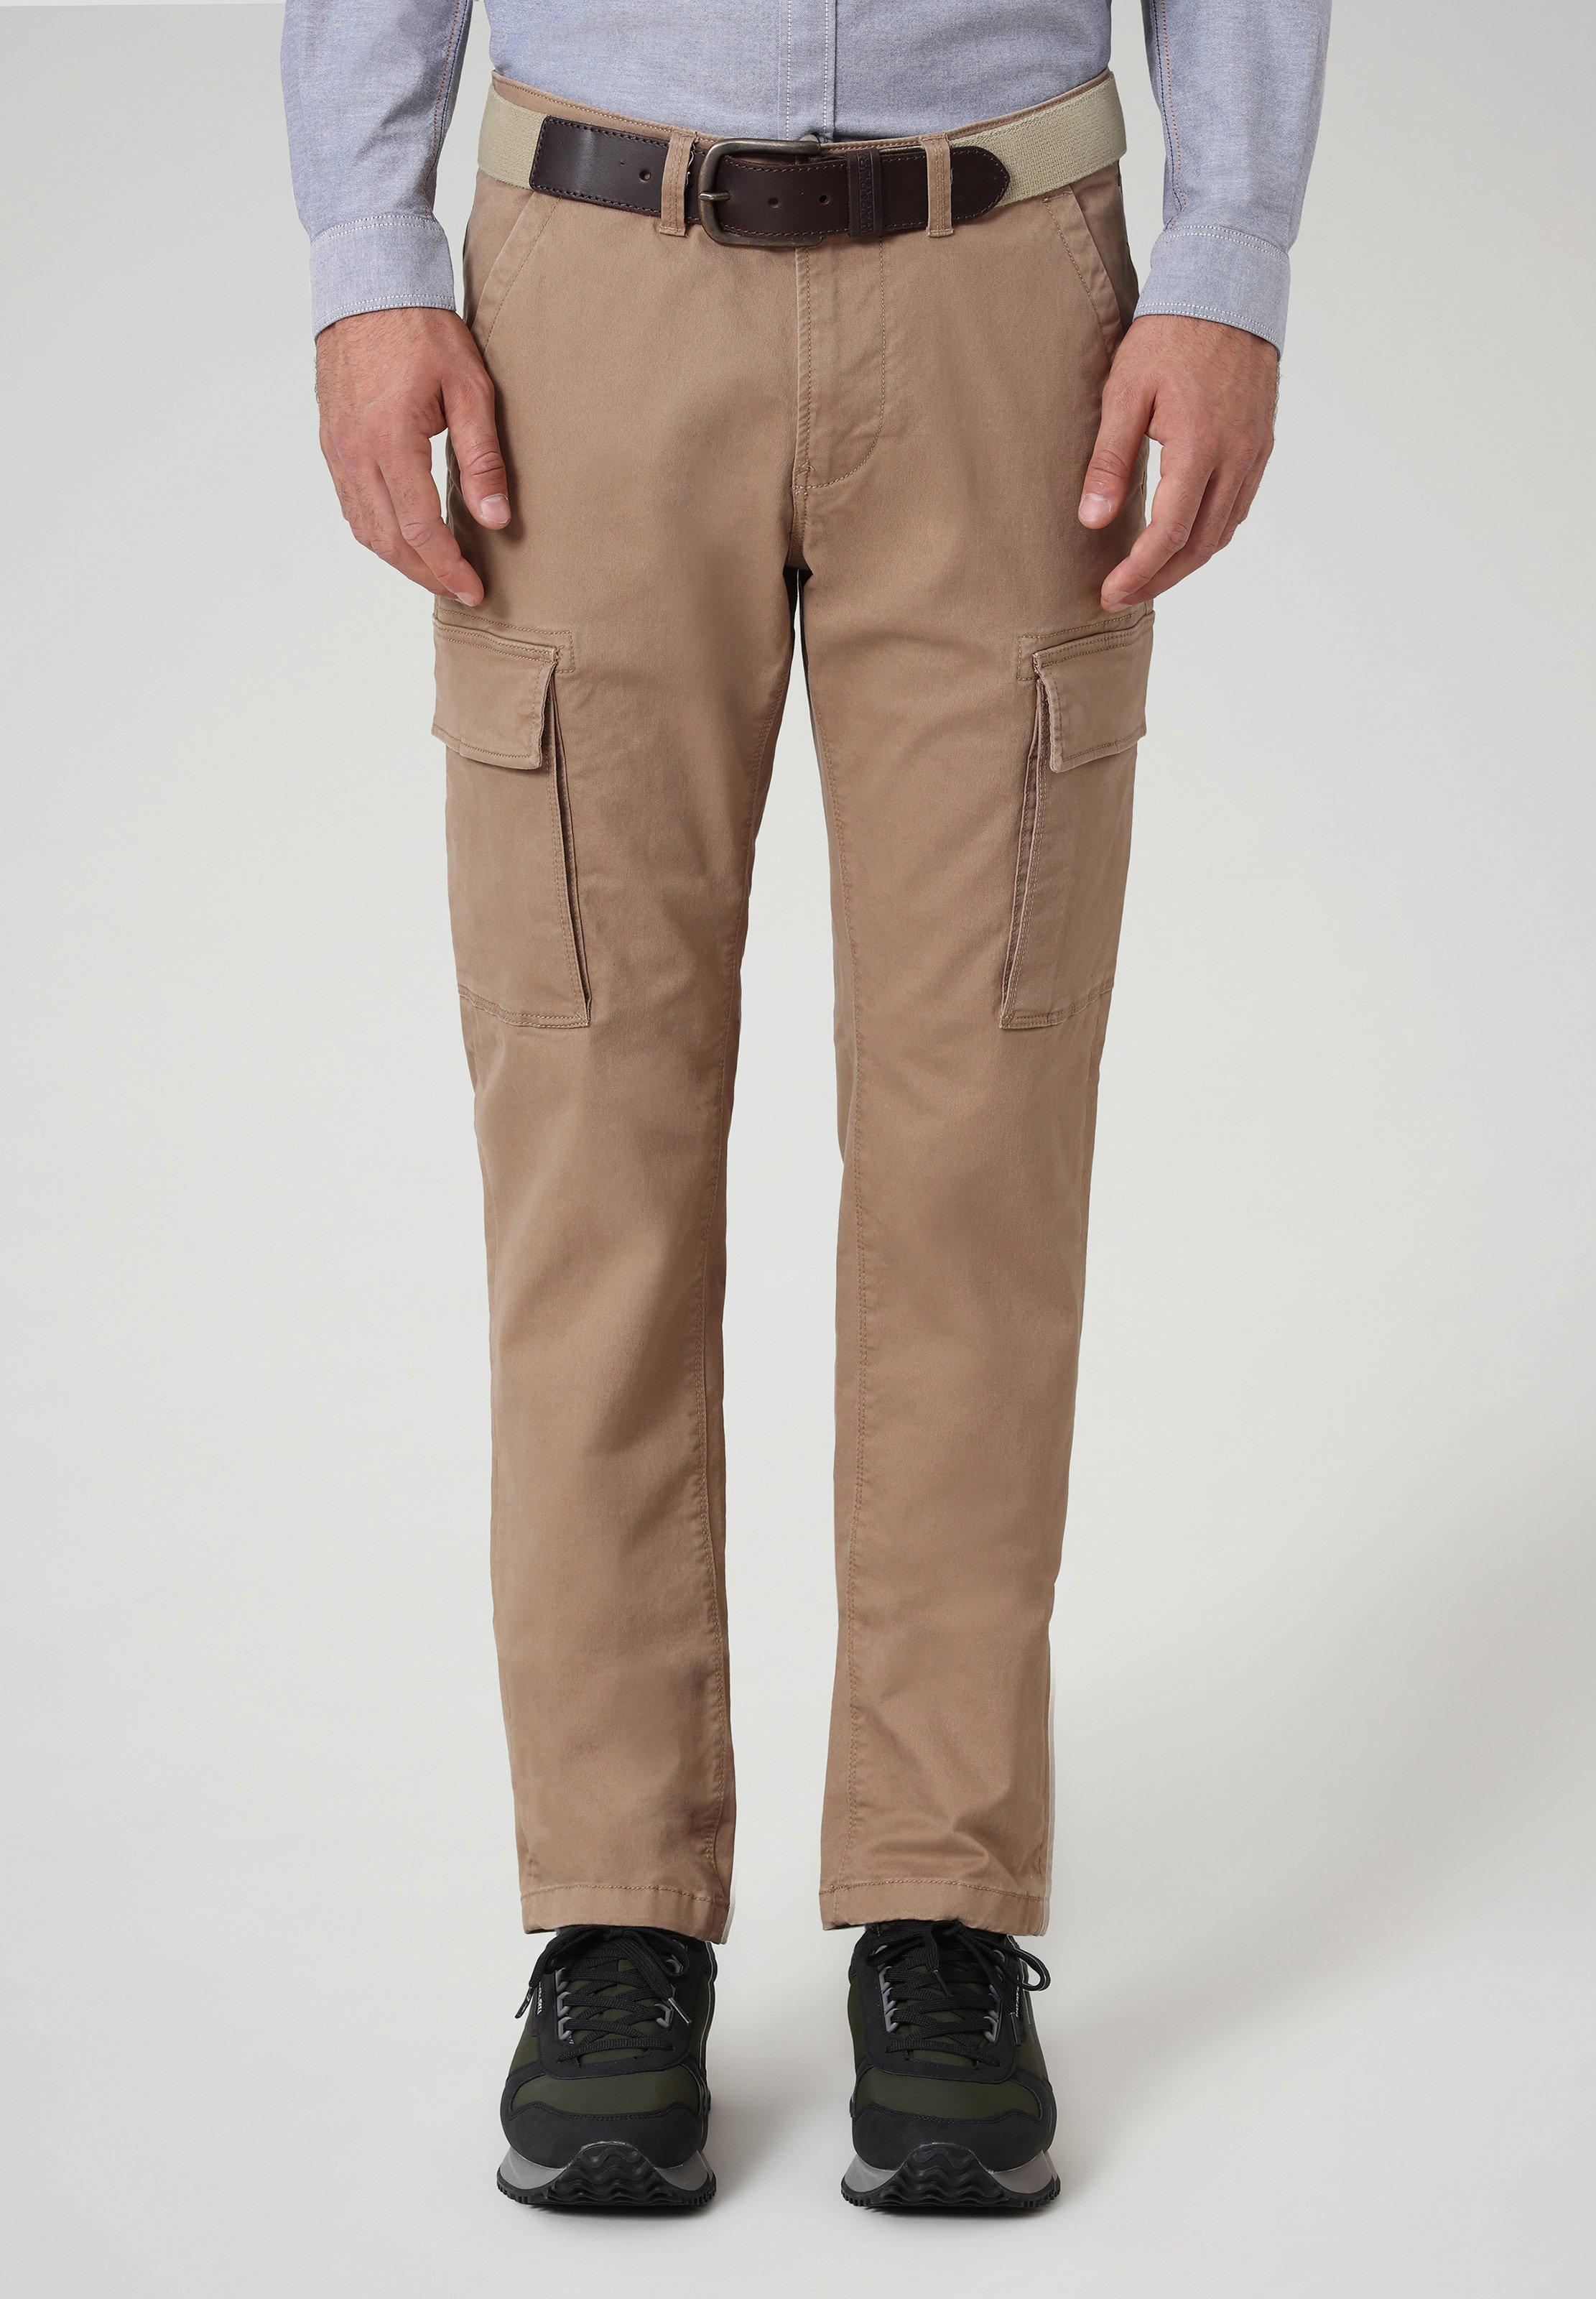 Homme MOTO WINT - Pantalon cargo